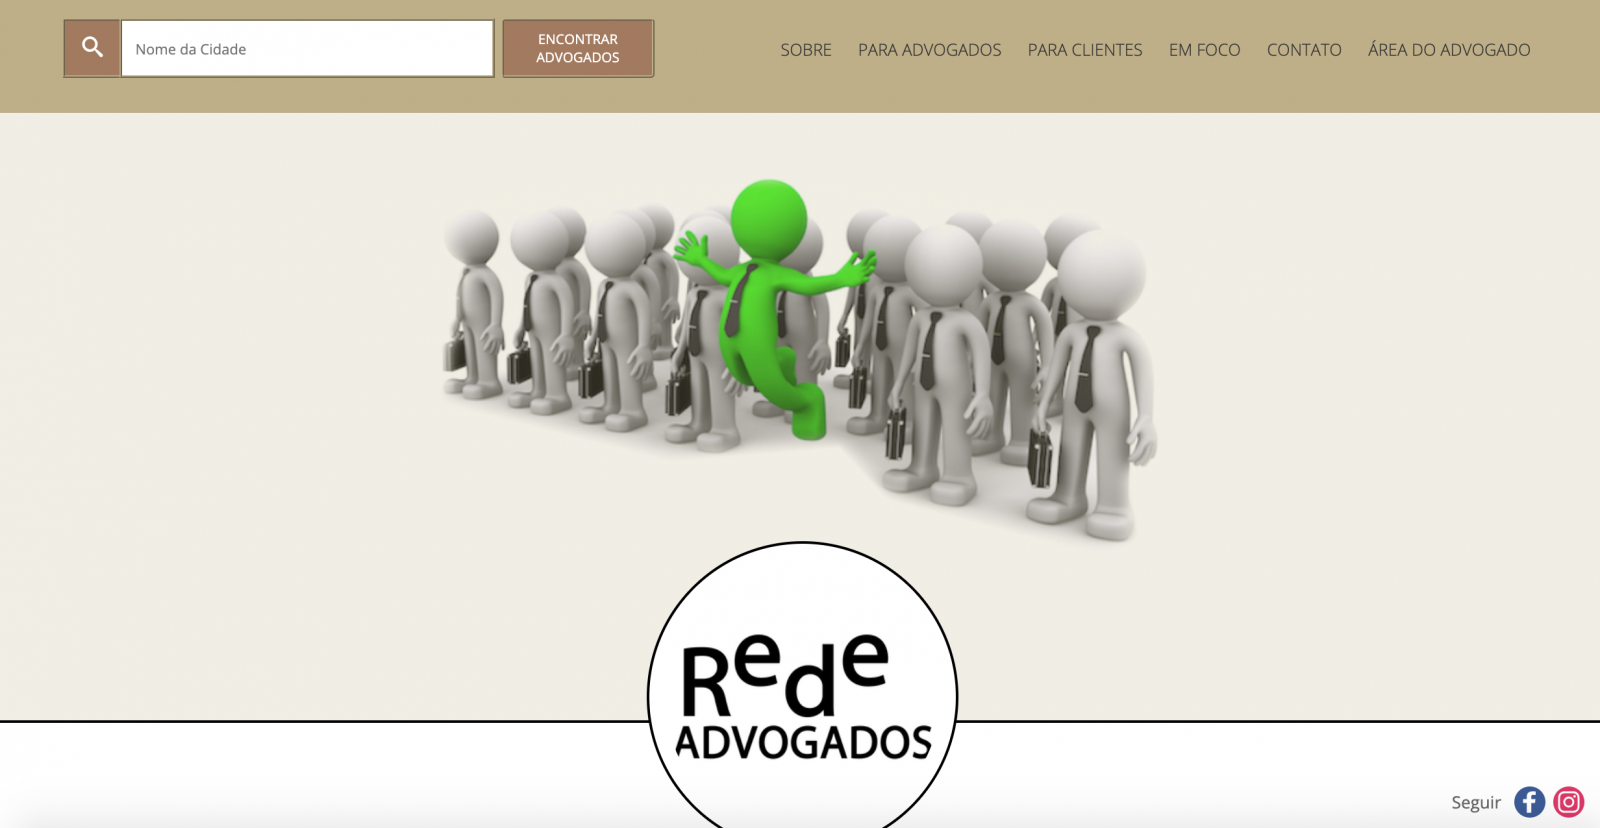 Portal Rede Advogados